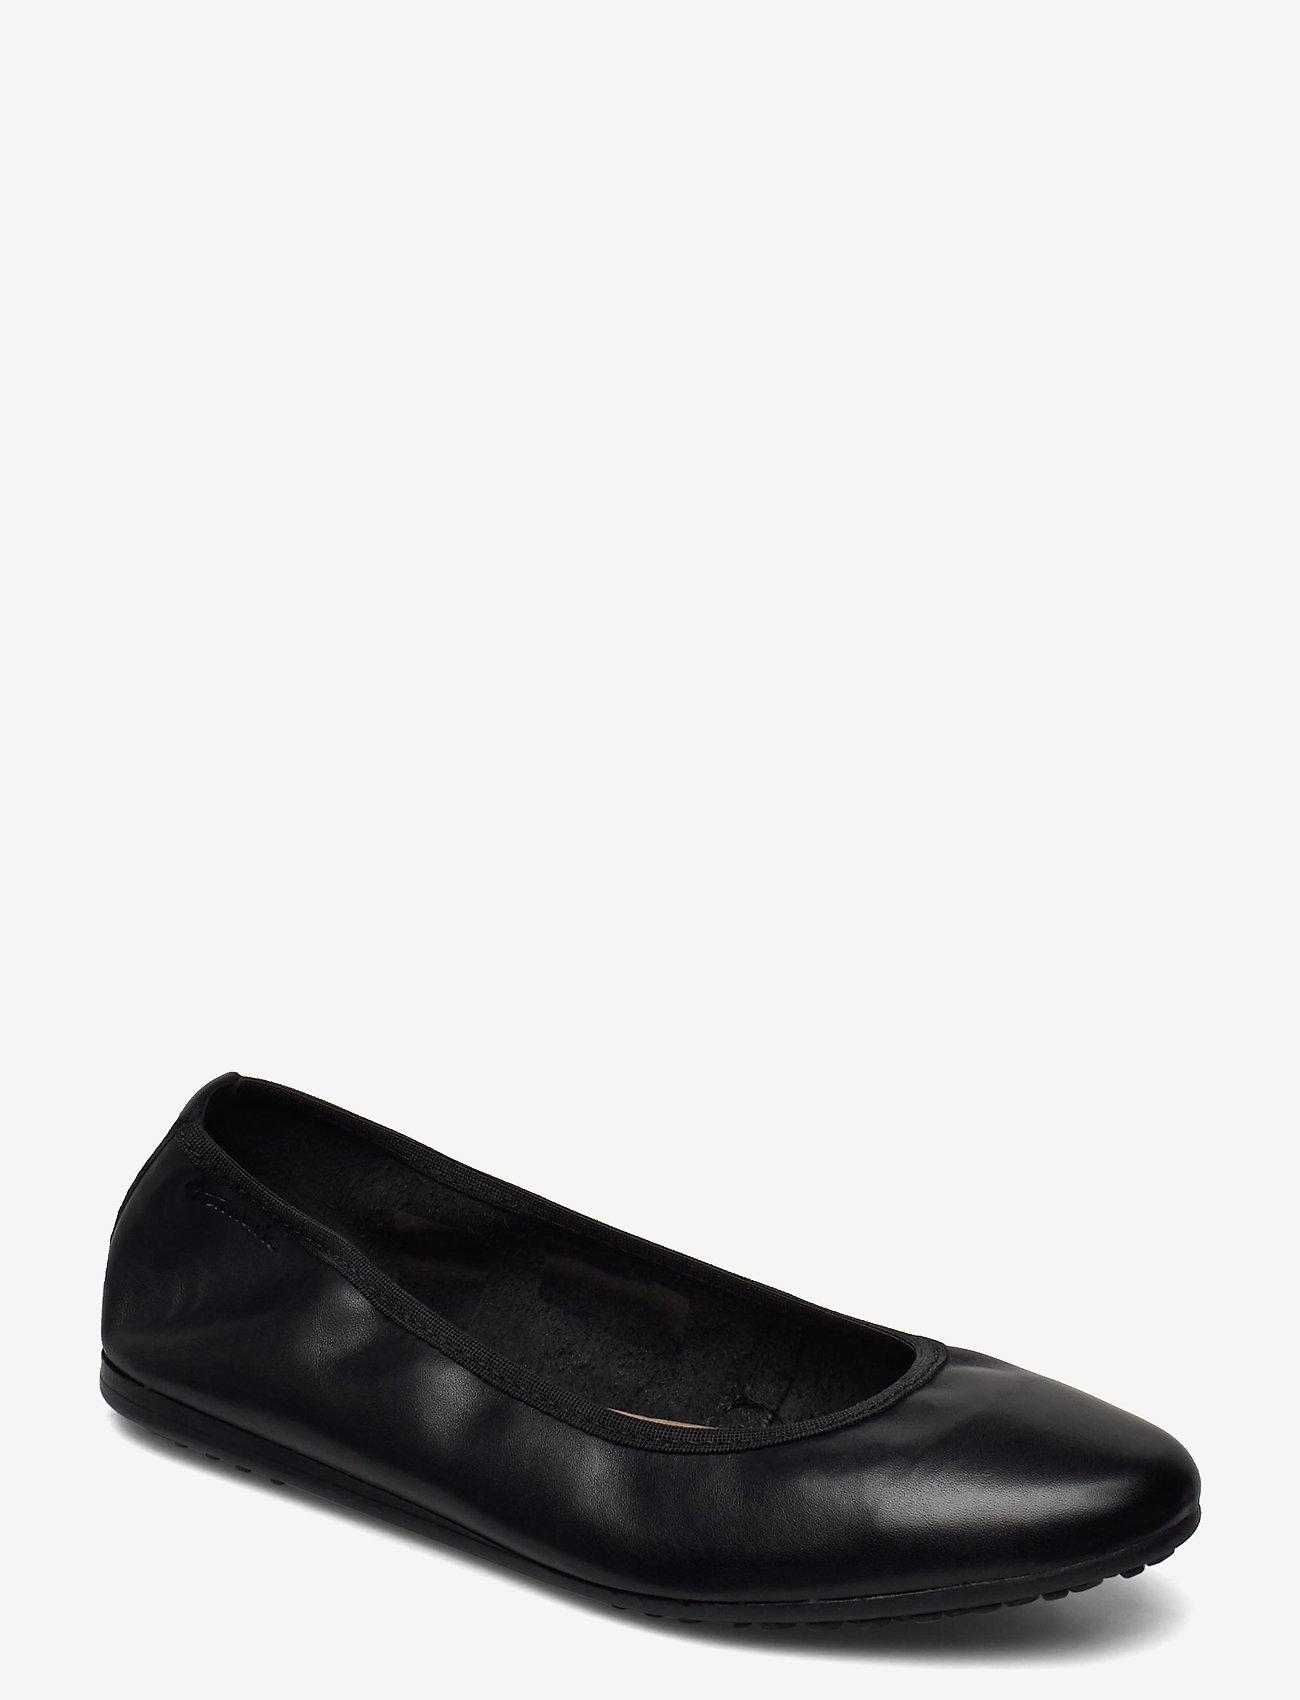 Tamaris - Woms Ballerina - ballerinas - black leather - 0